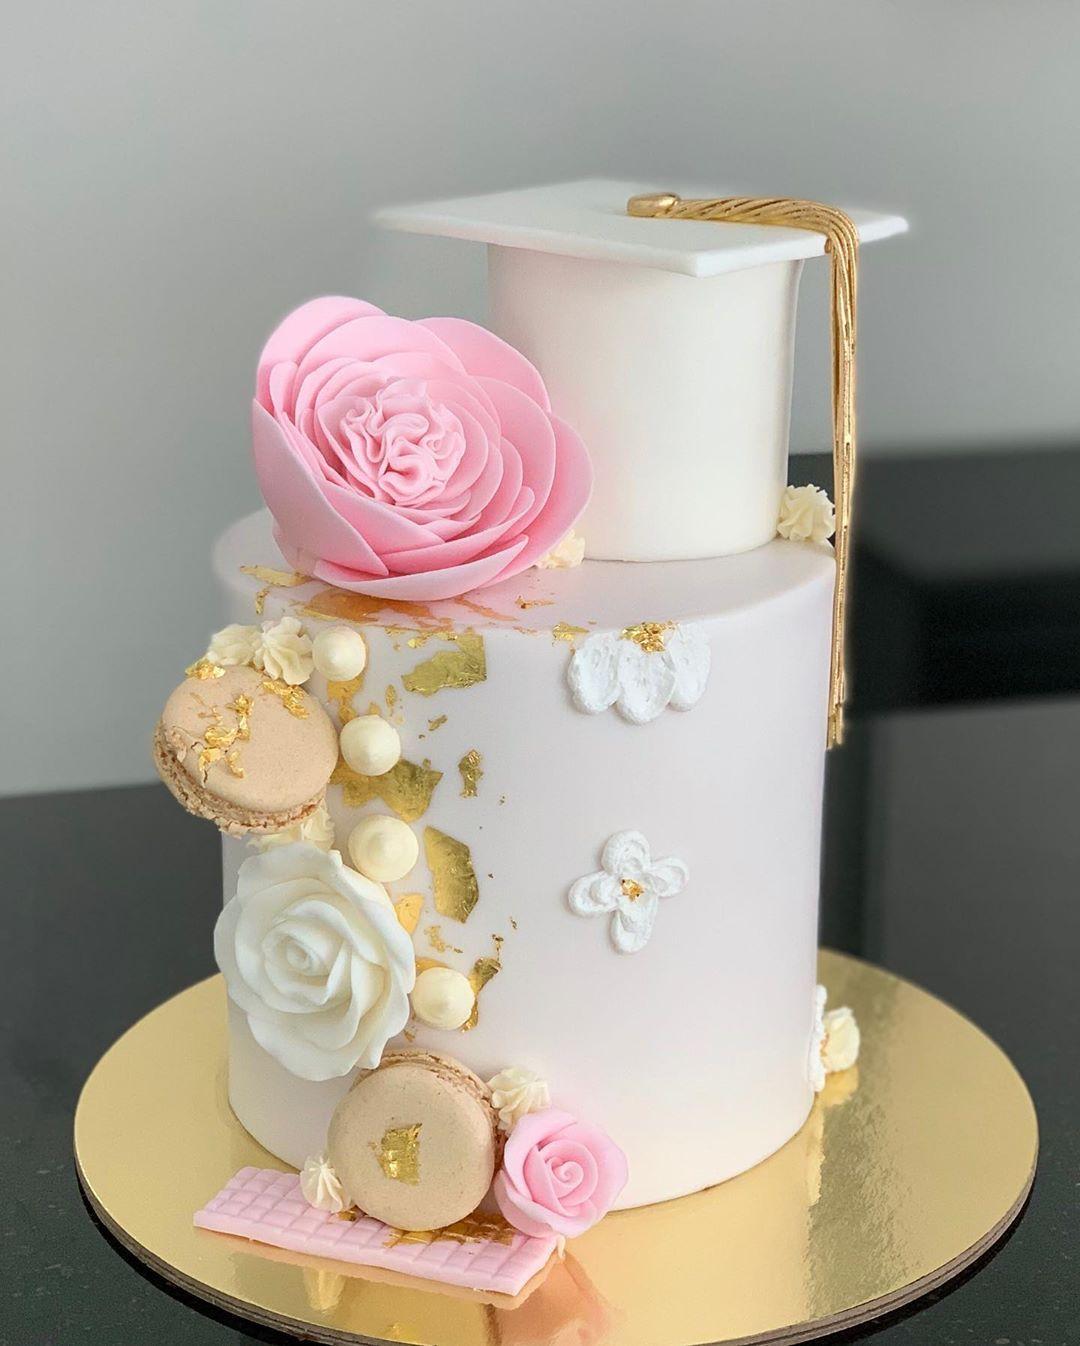 كيكه تخرج ابوظبي كيك تخرج بنت ثناويه كيكه تخرج توصيل الامارات كيكه تخرج توصيل دبي احلى كيك Graduation Cakes Graduation Cake Designs Cute Birthday Cakes